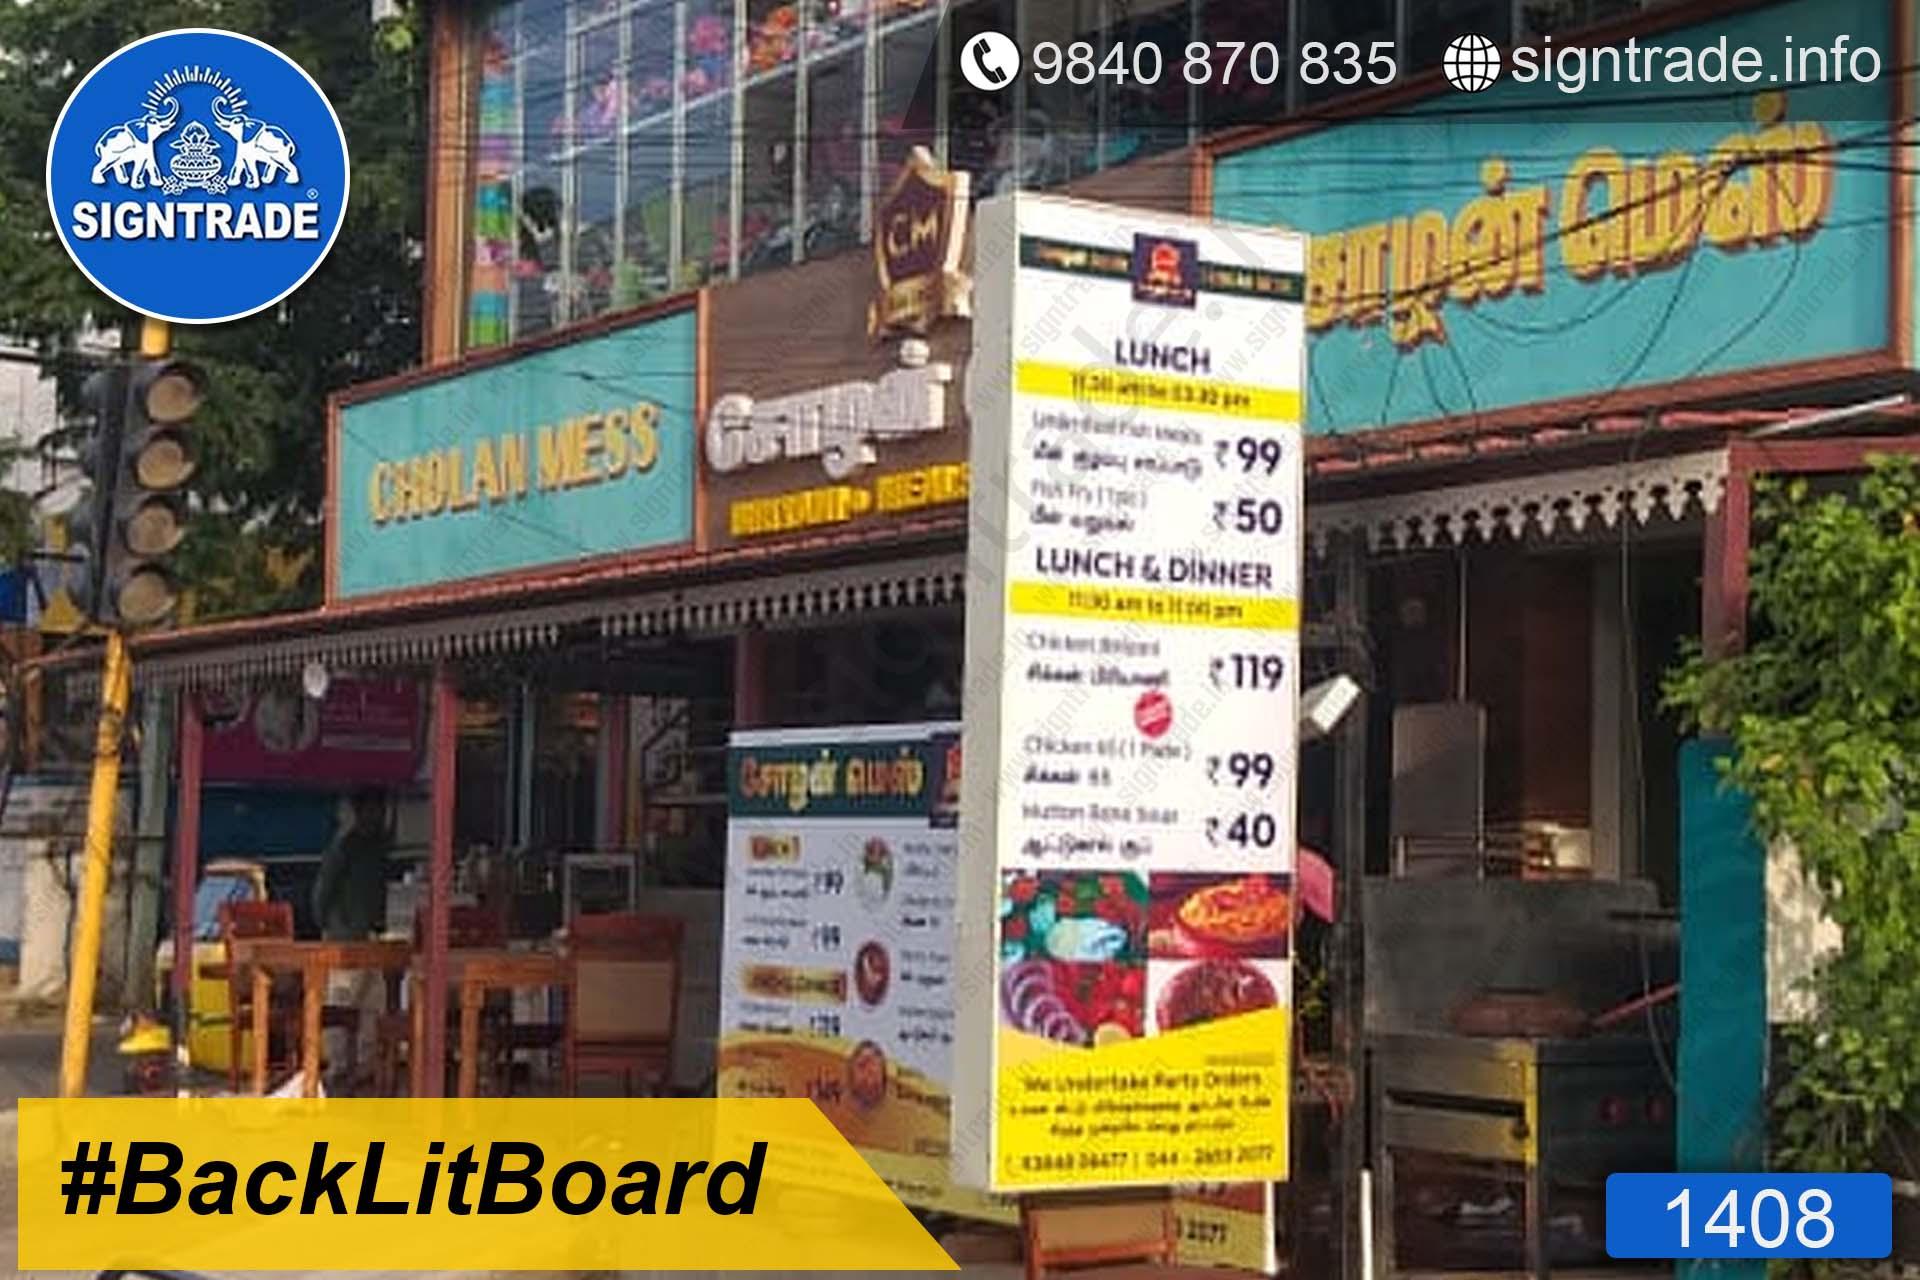 Cholan Mess - 1408, Flex Board, Backlit Flex Board, Star Backlit Flex Board, Backlit Flex Banners, Shop Front Flex Board, Shop Flex Board